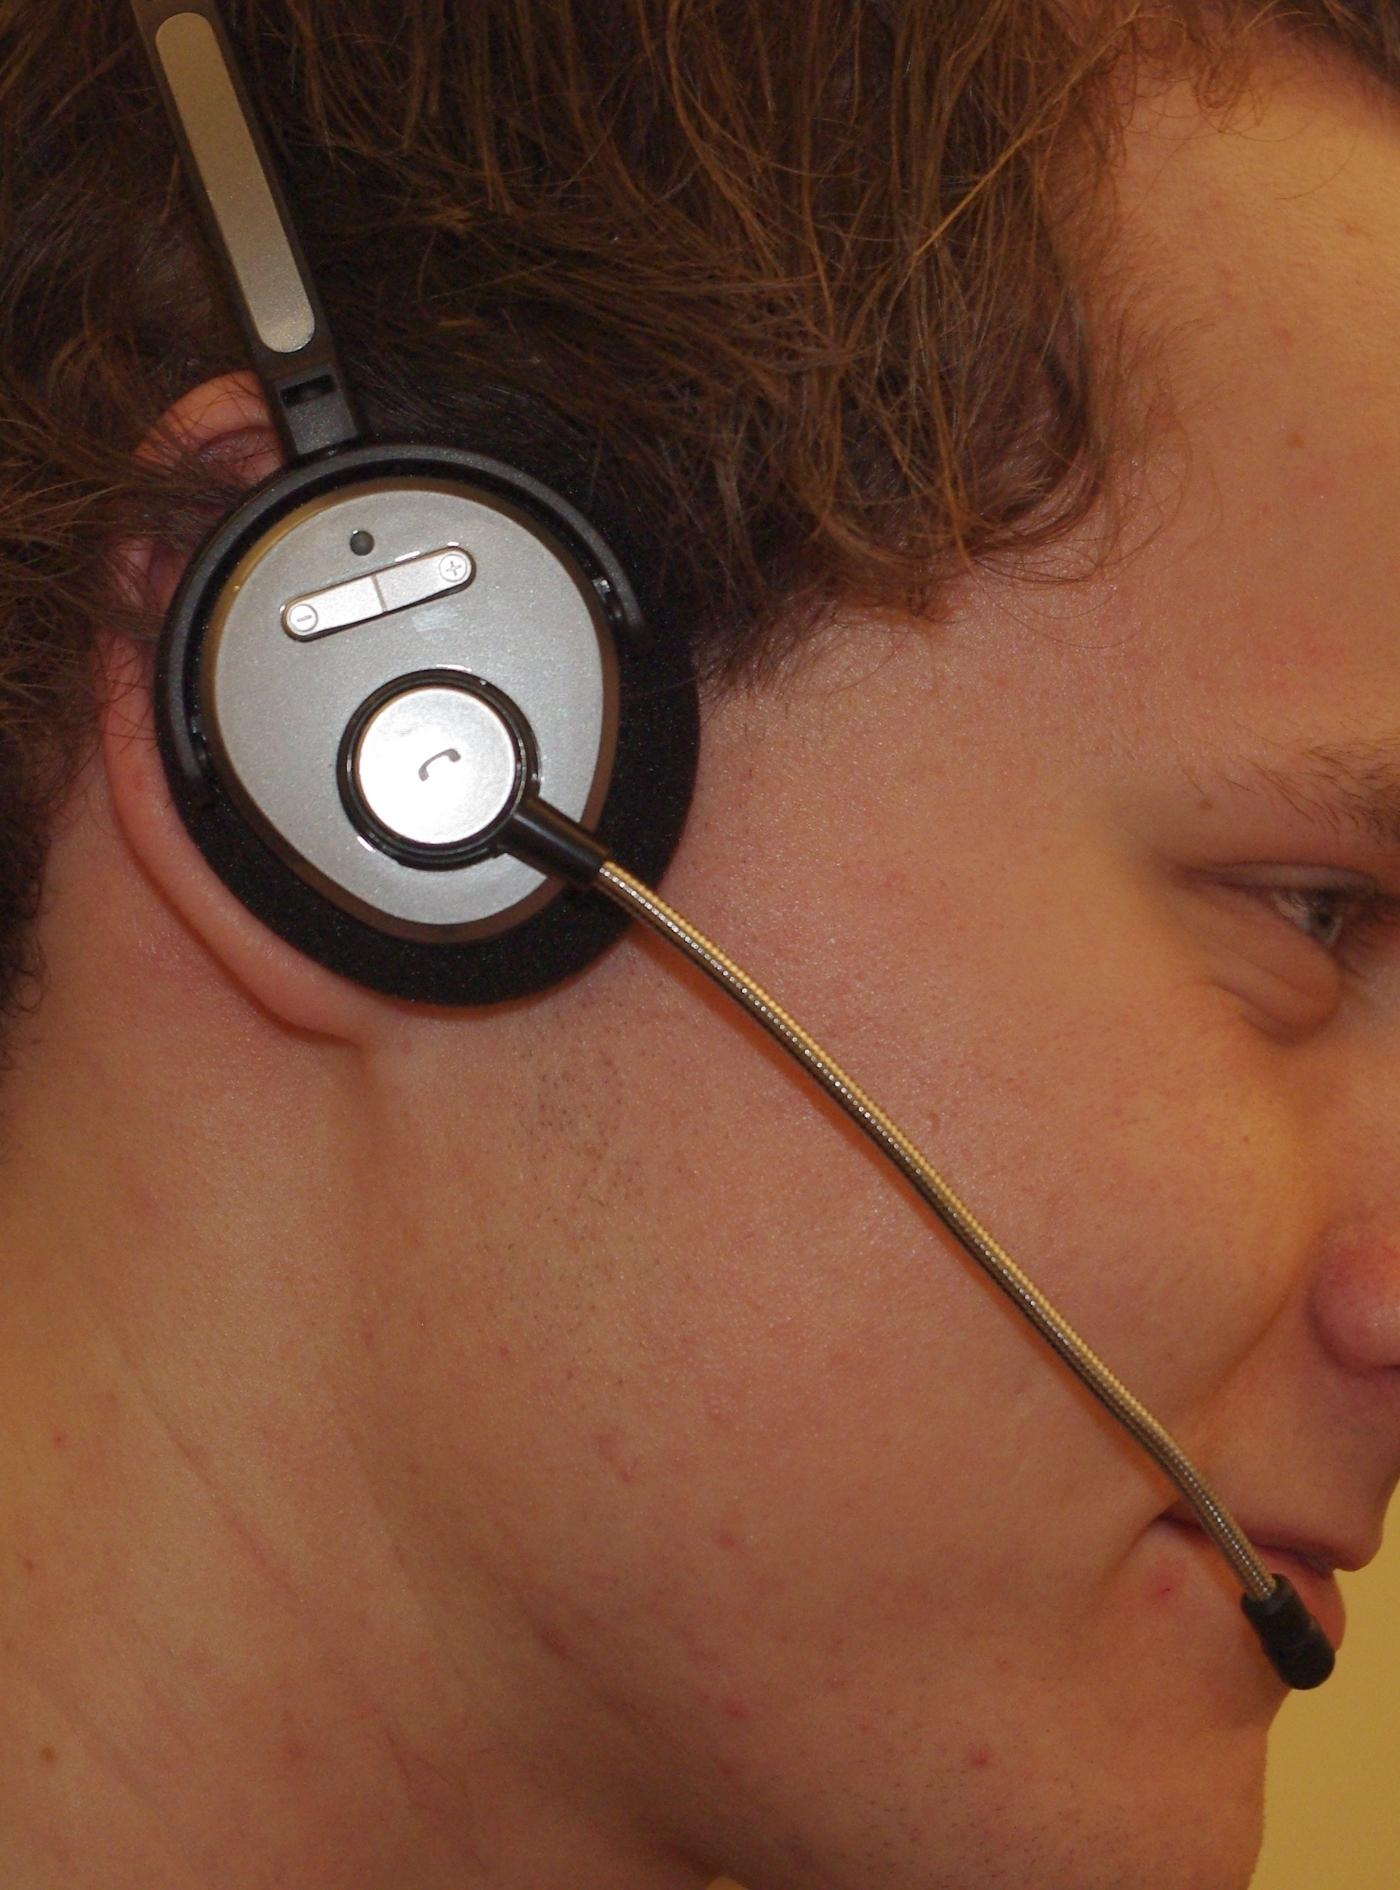 AH5 er behagelig på øret.